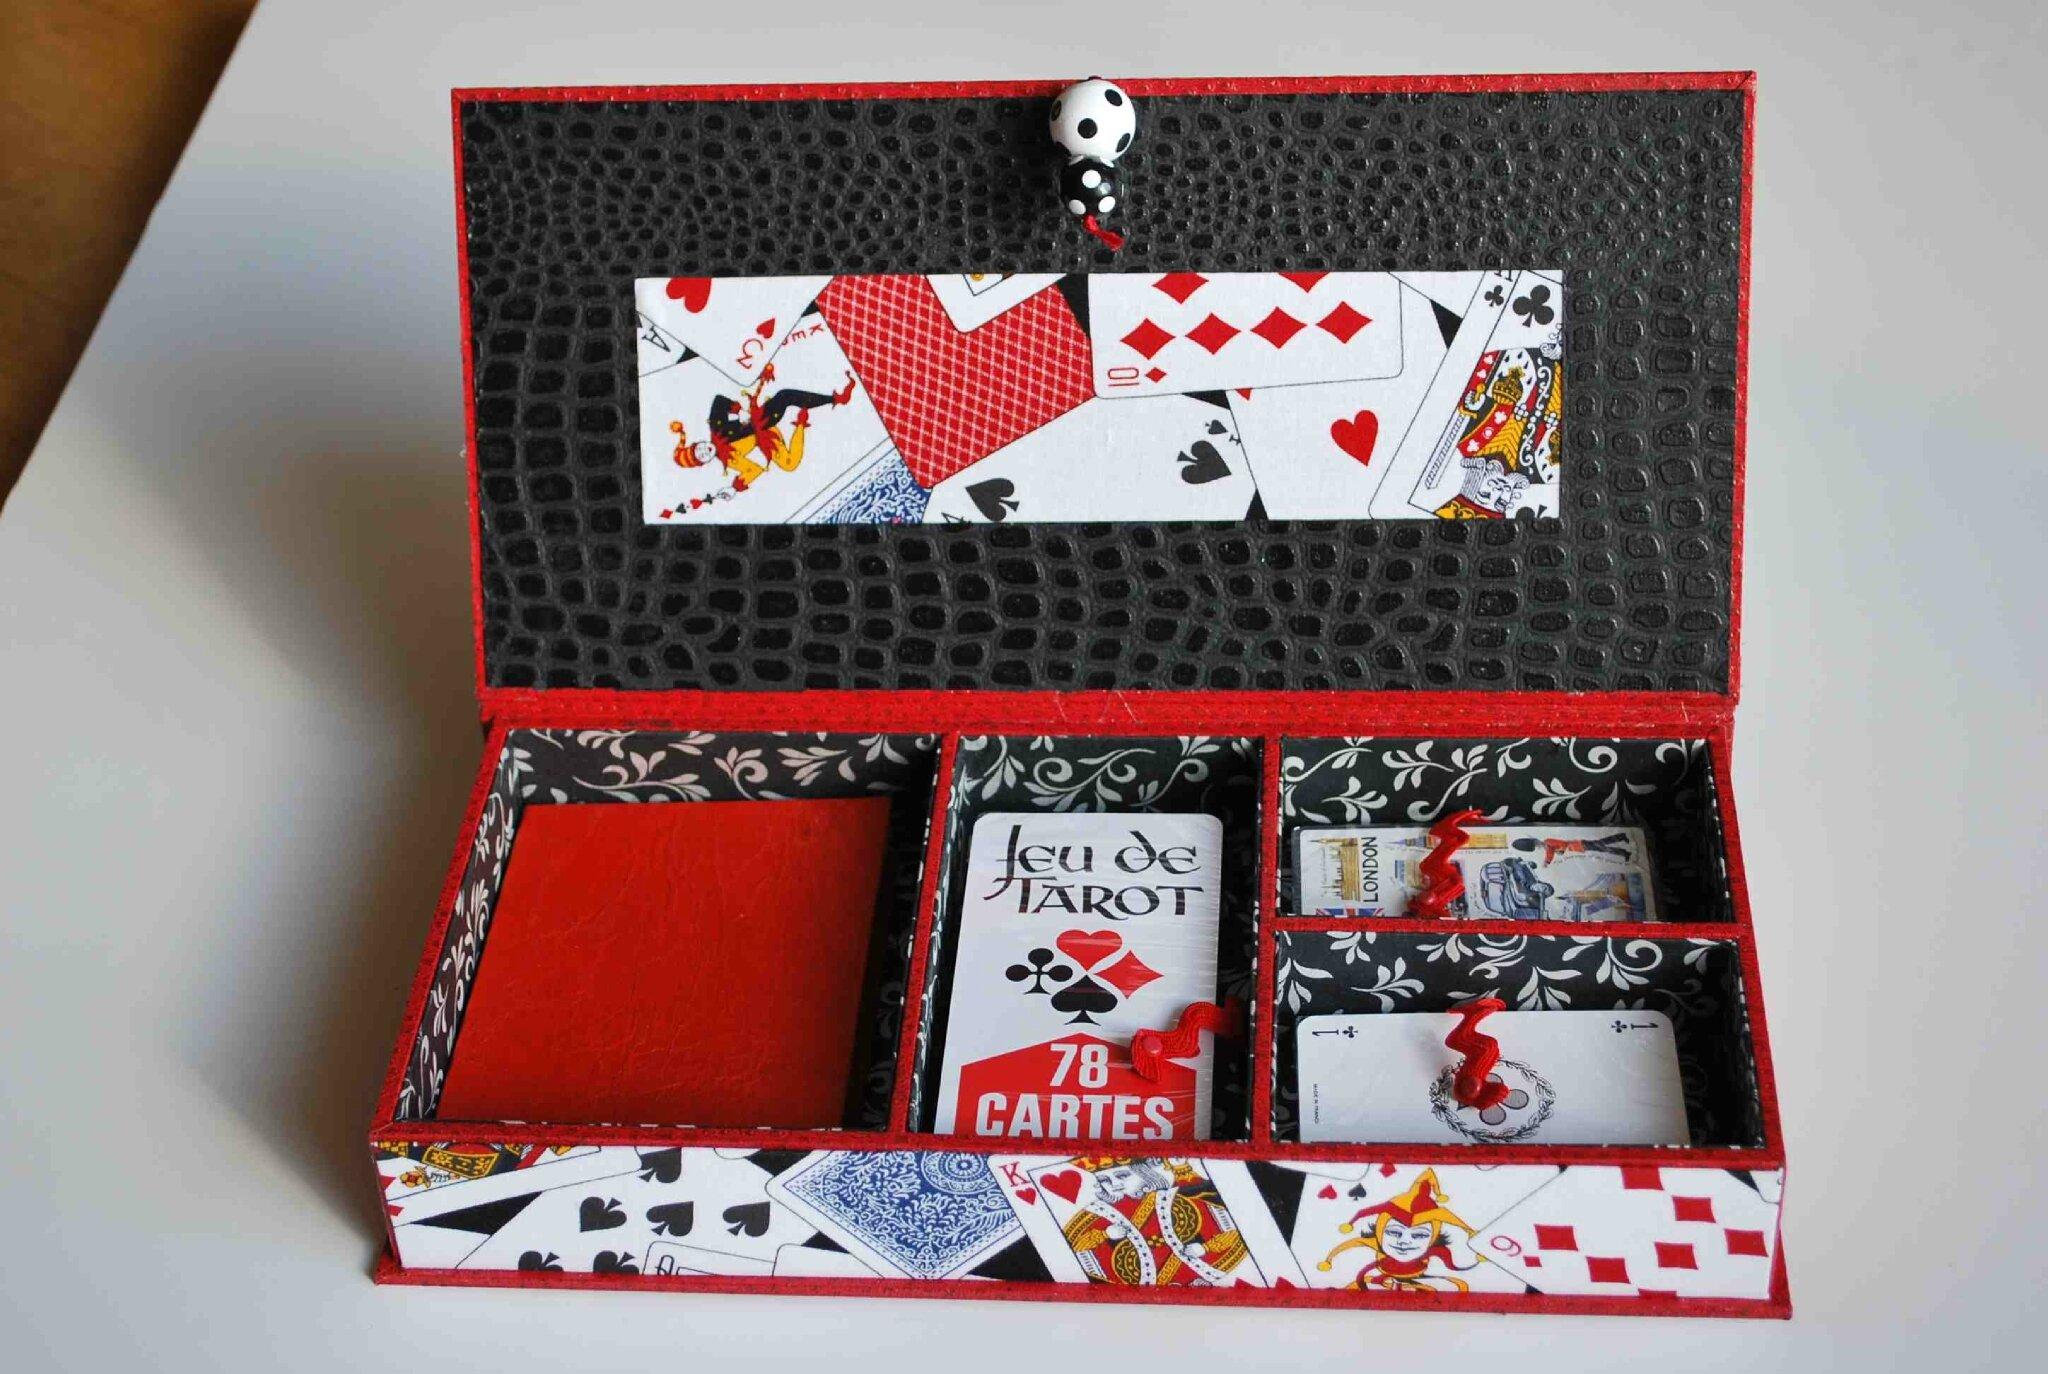 bo te jeux de cartes les cadres vaugneray